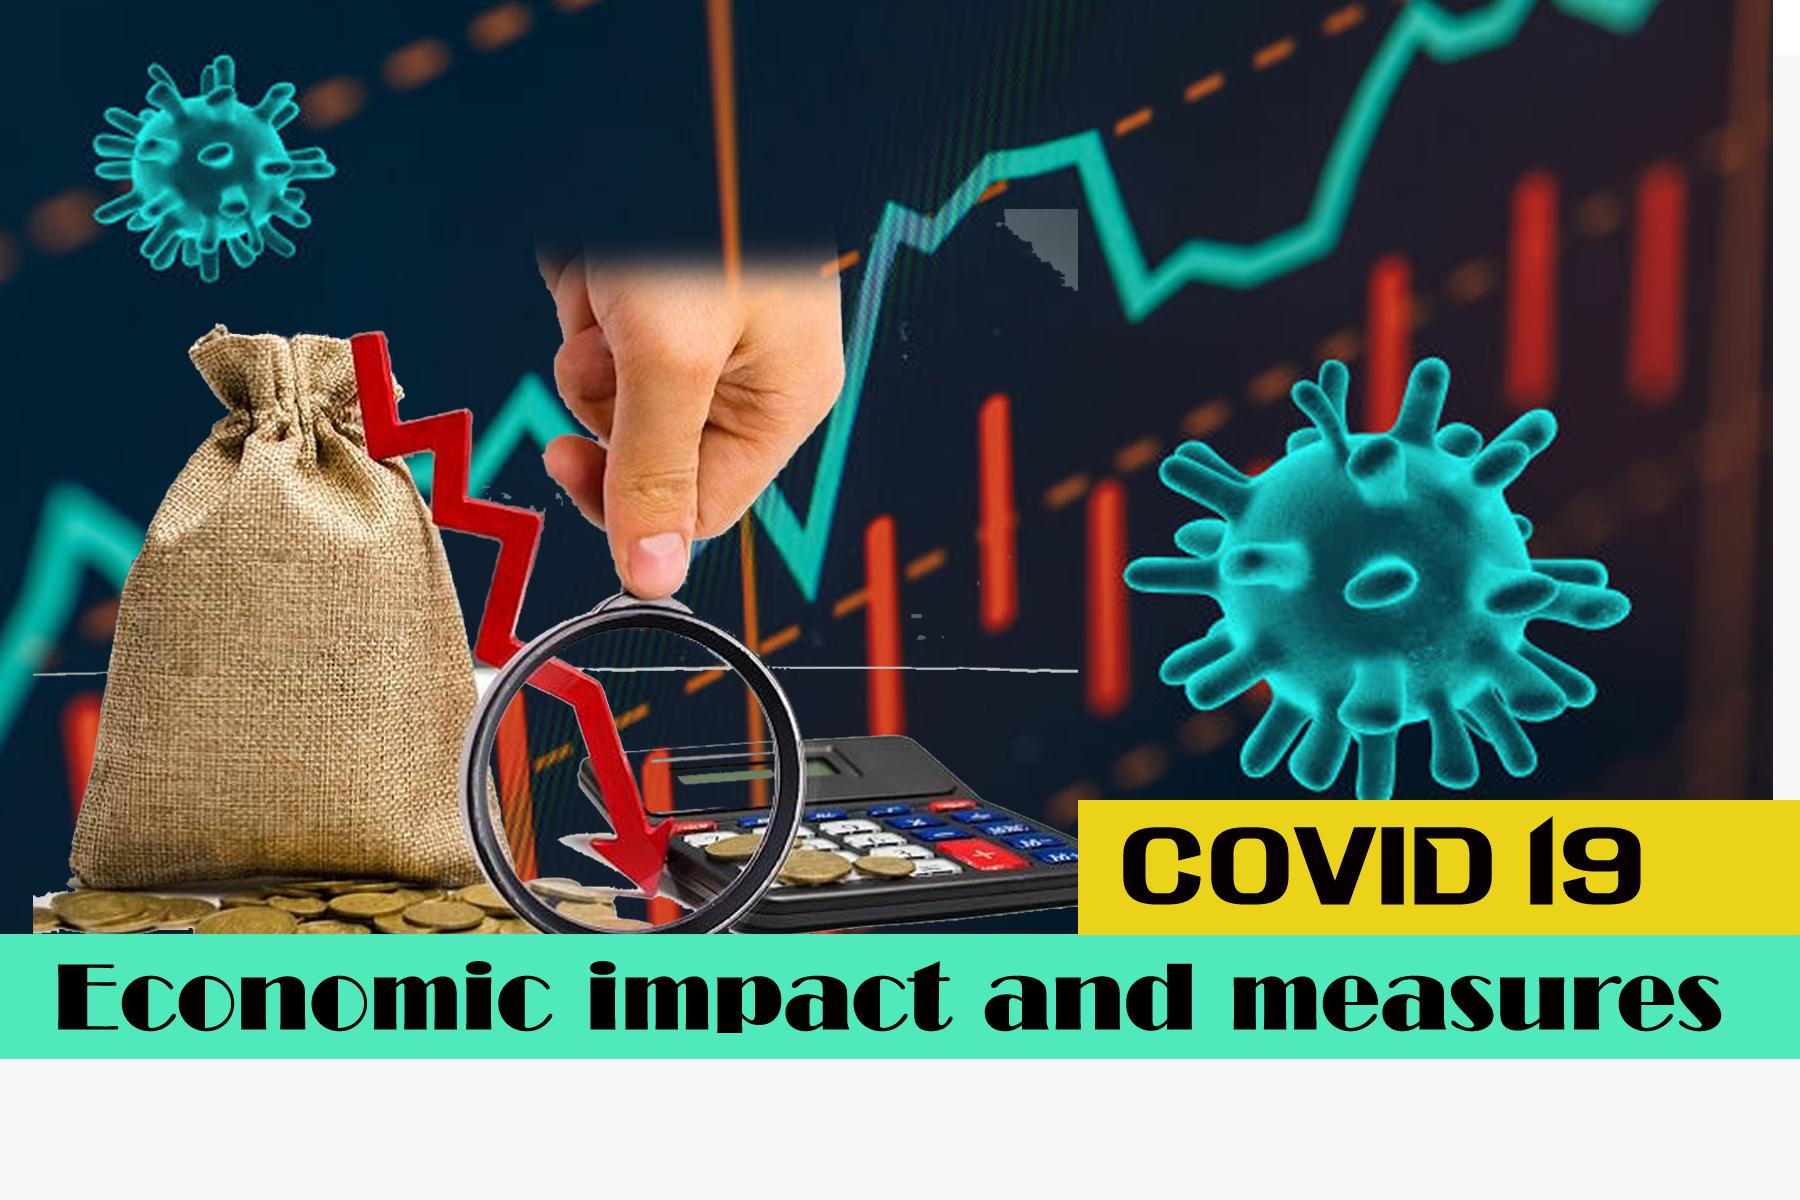 Covid 19 Pendamic: Economic impact and measures